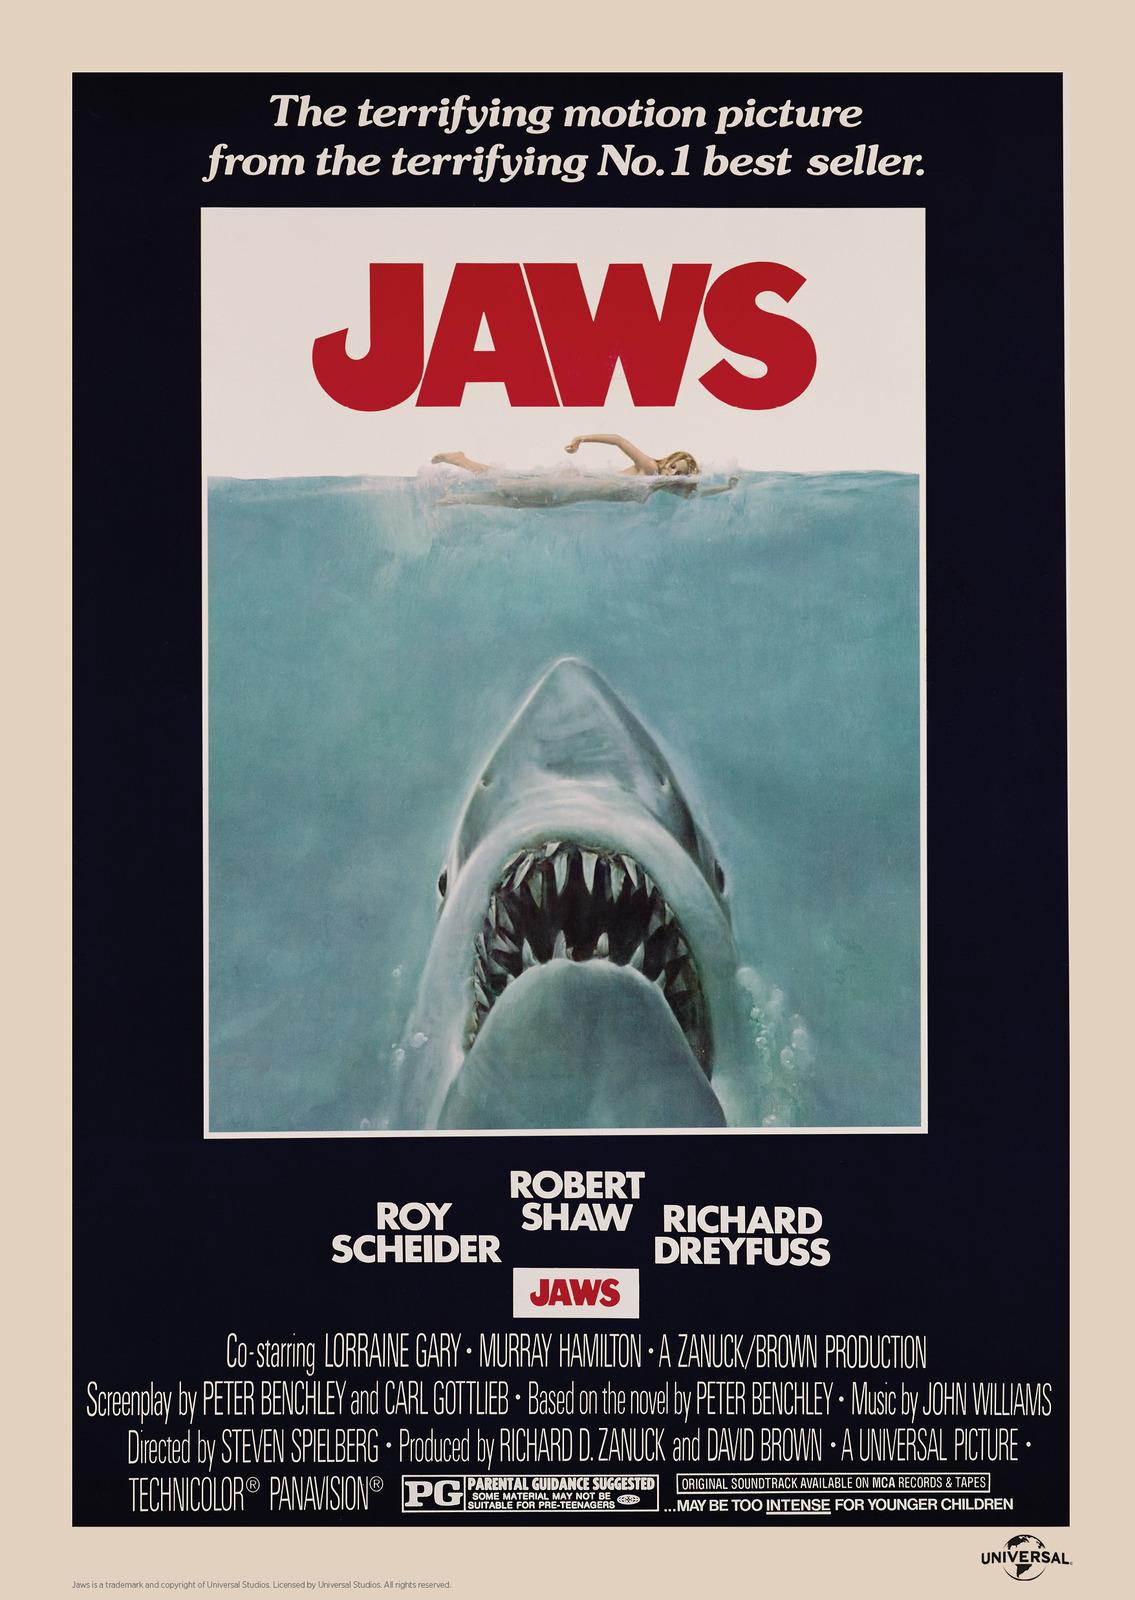 Jaws: Premium Art Print - Classic Poster image